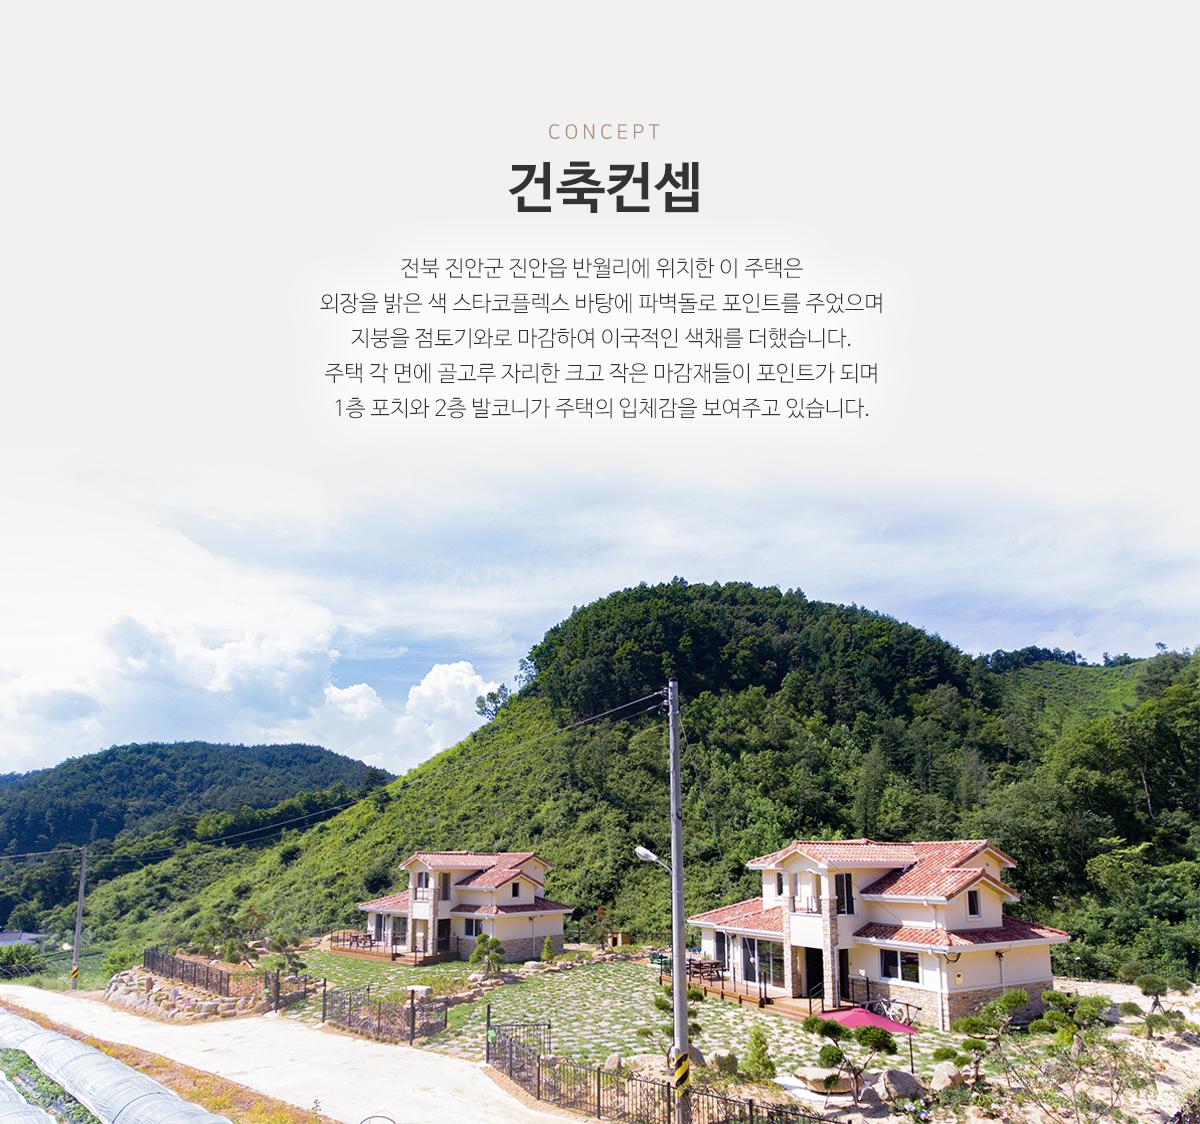 001_main_전북-진안읍-반원리_김봉례_03.jpg